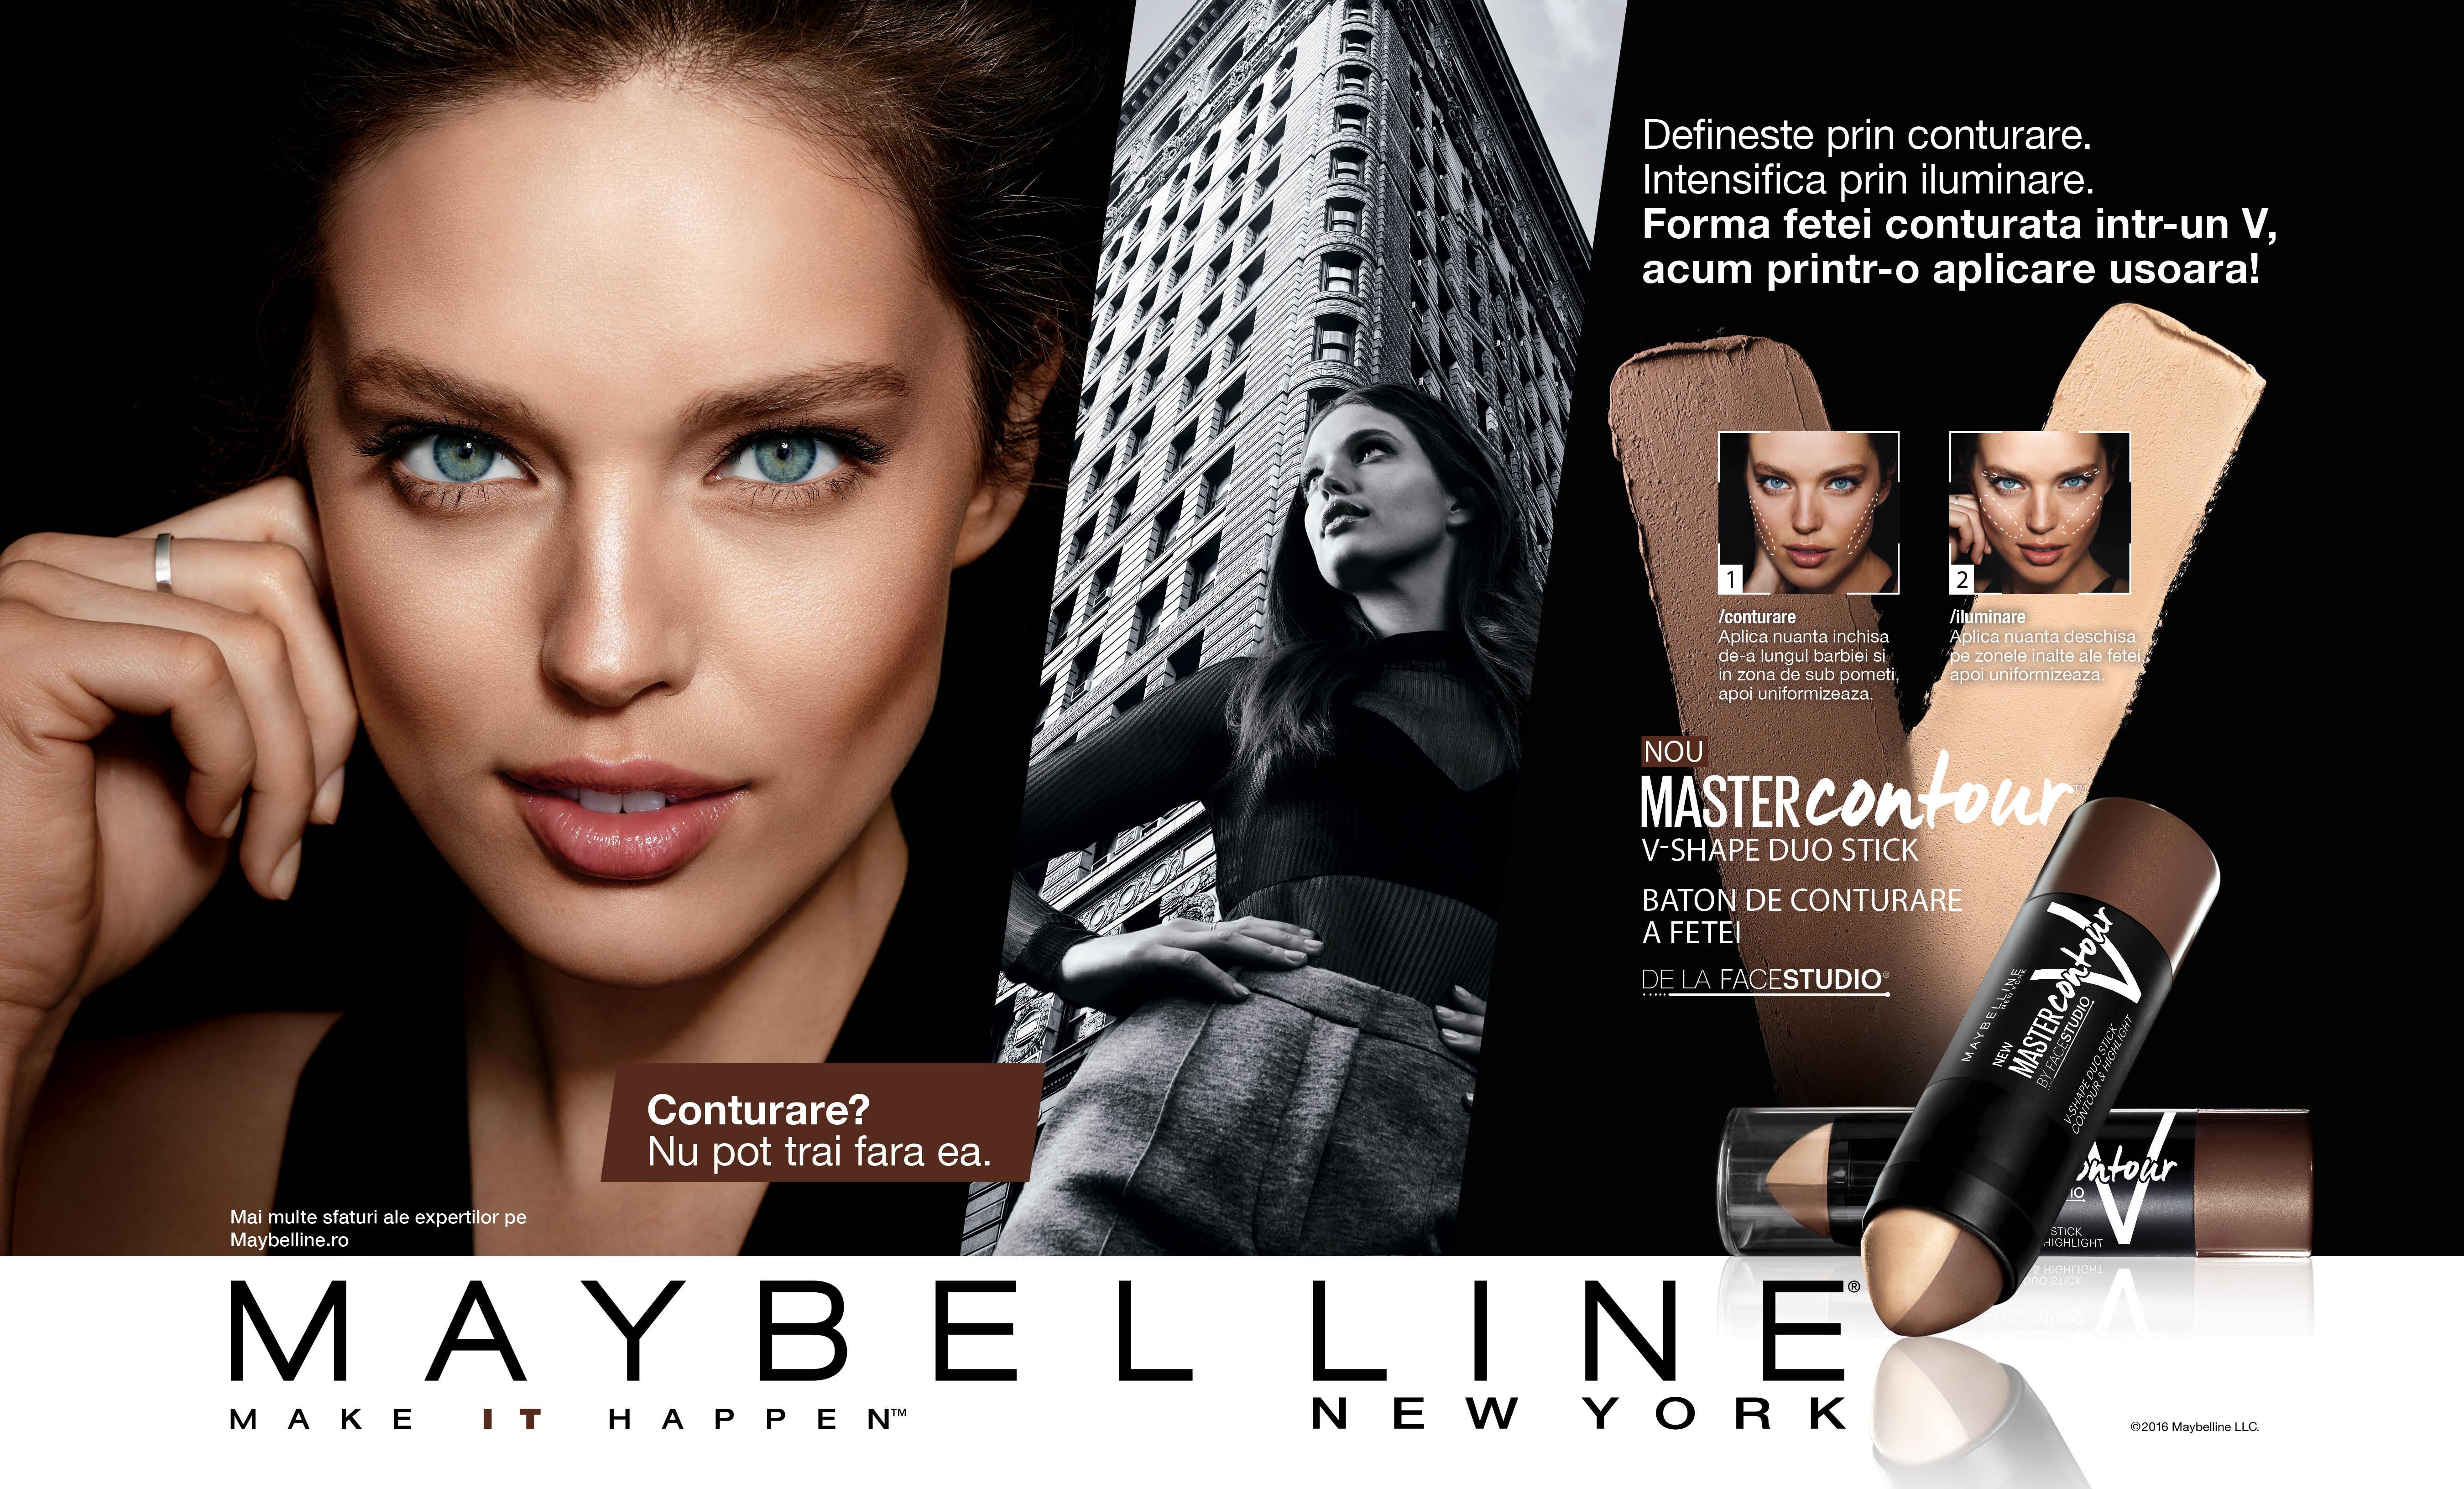 Baton de conturare a fetei Maybelline Master Contour V Shape Duo, 02 MEDIUM 7